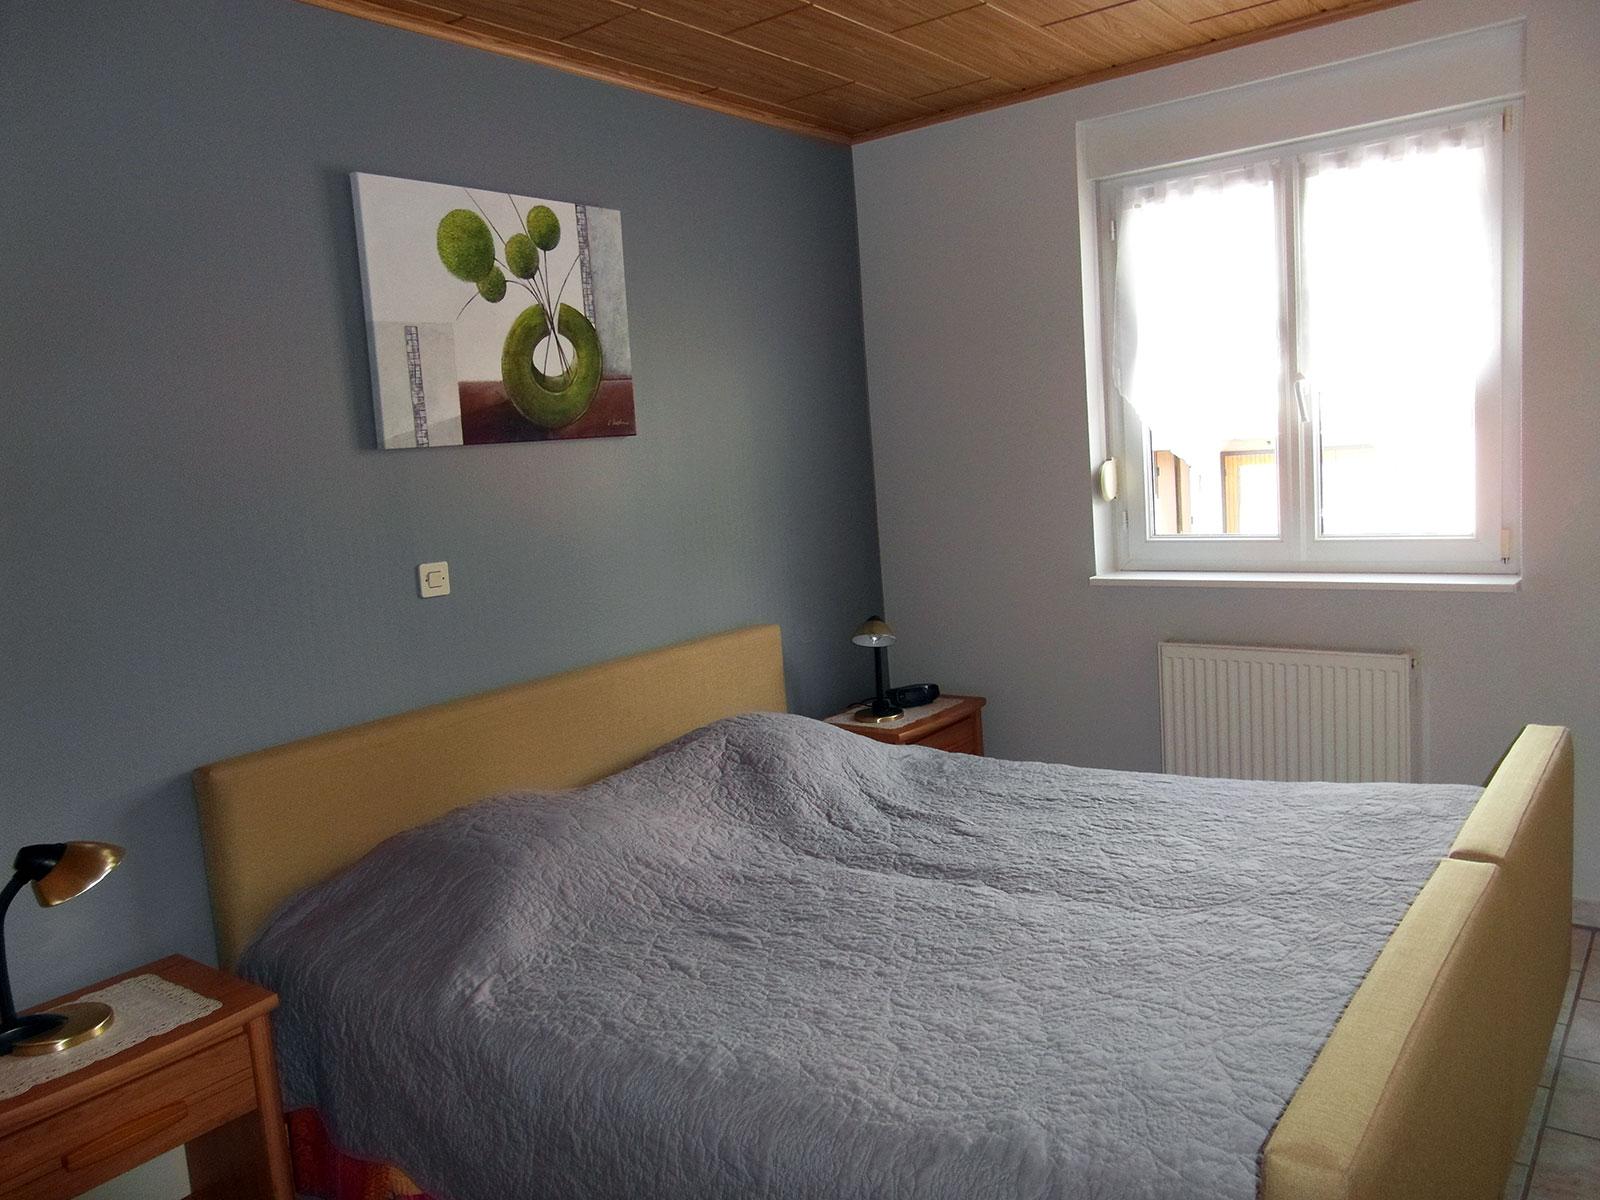 Accommodation  of Mr. Rickling - L'arum